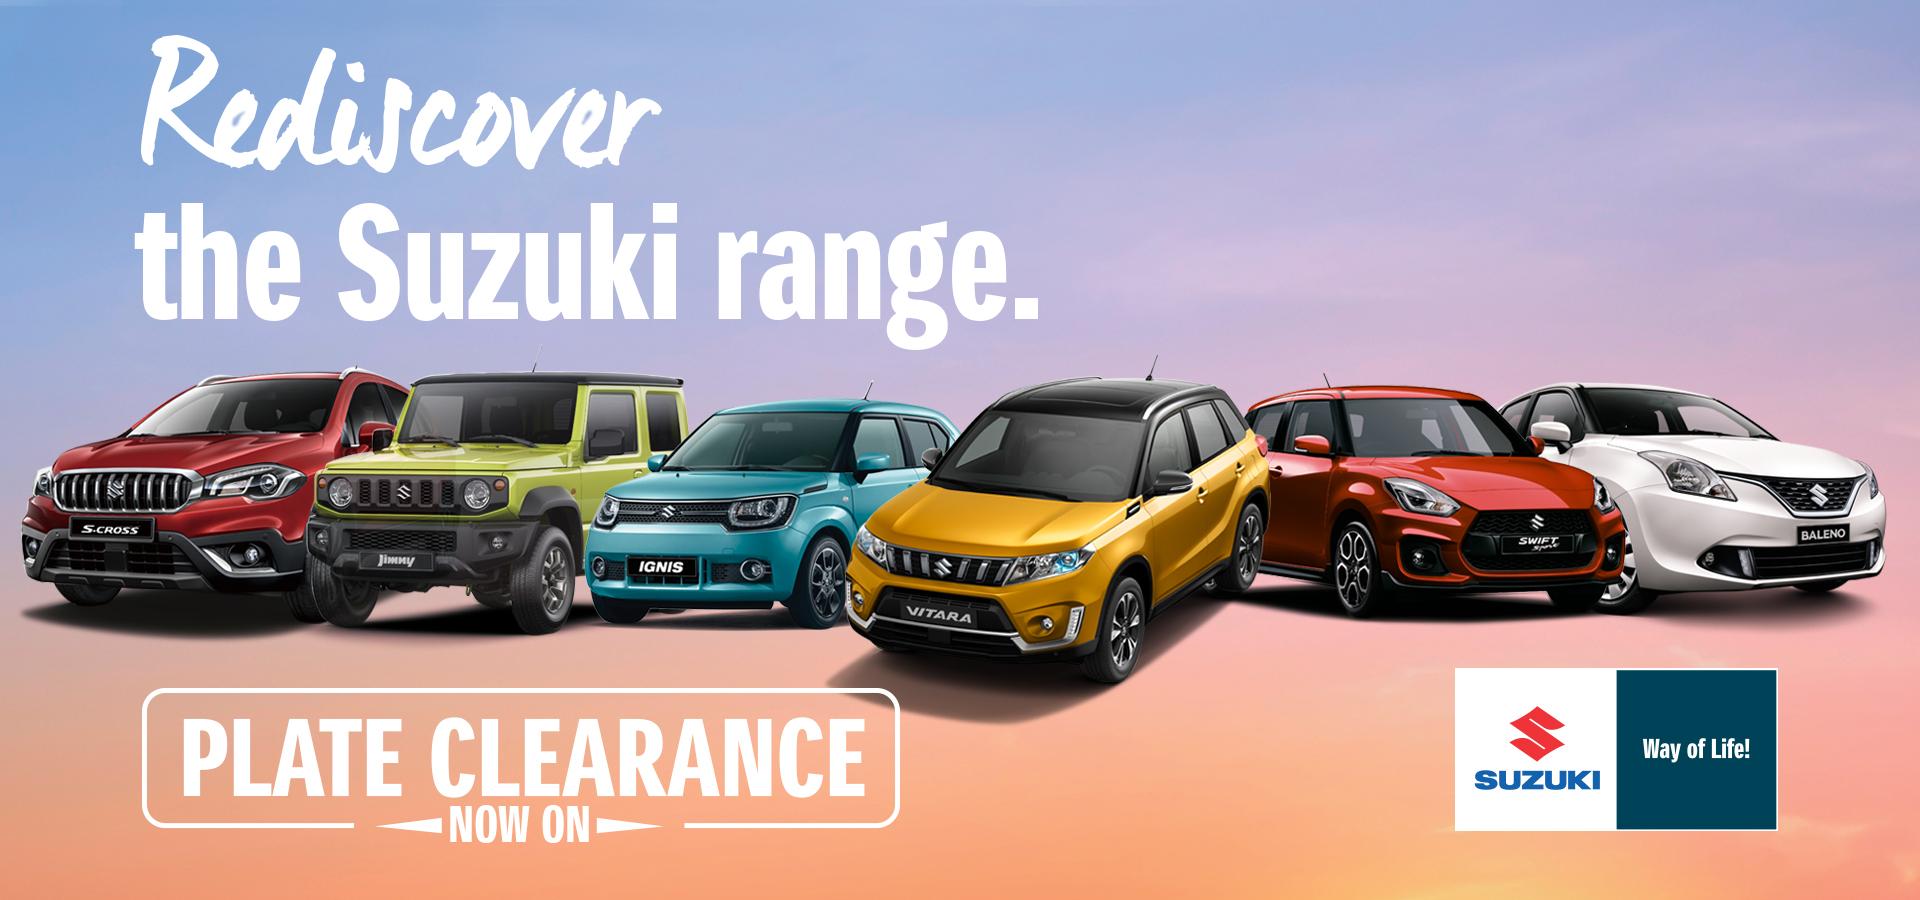 Suzuki Queensland Place Clearance